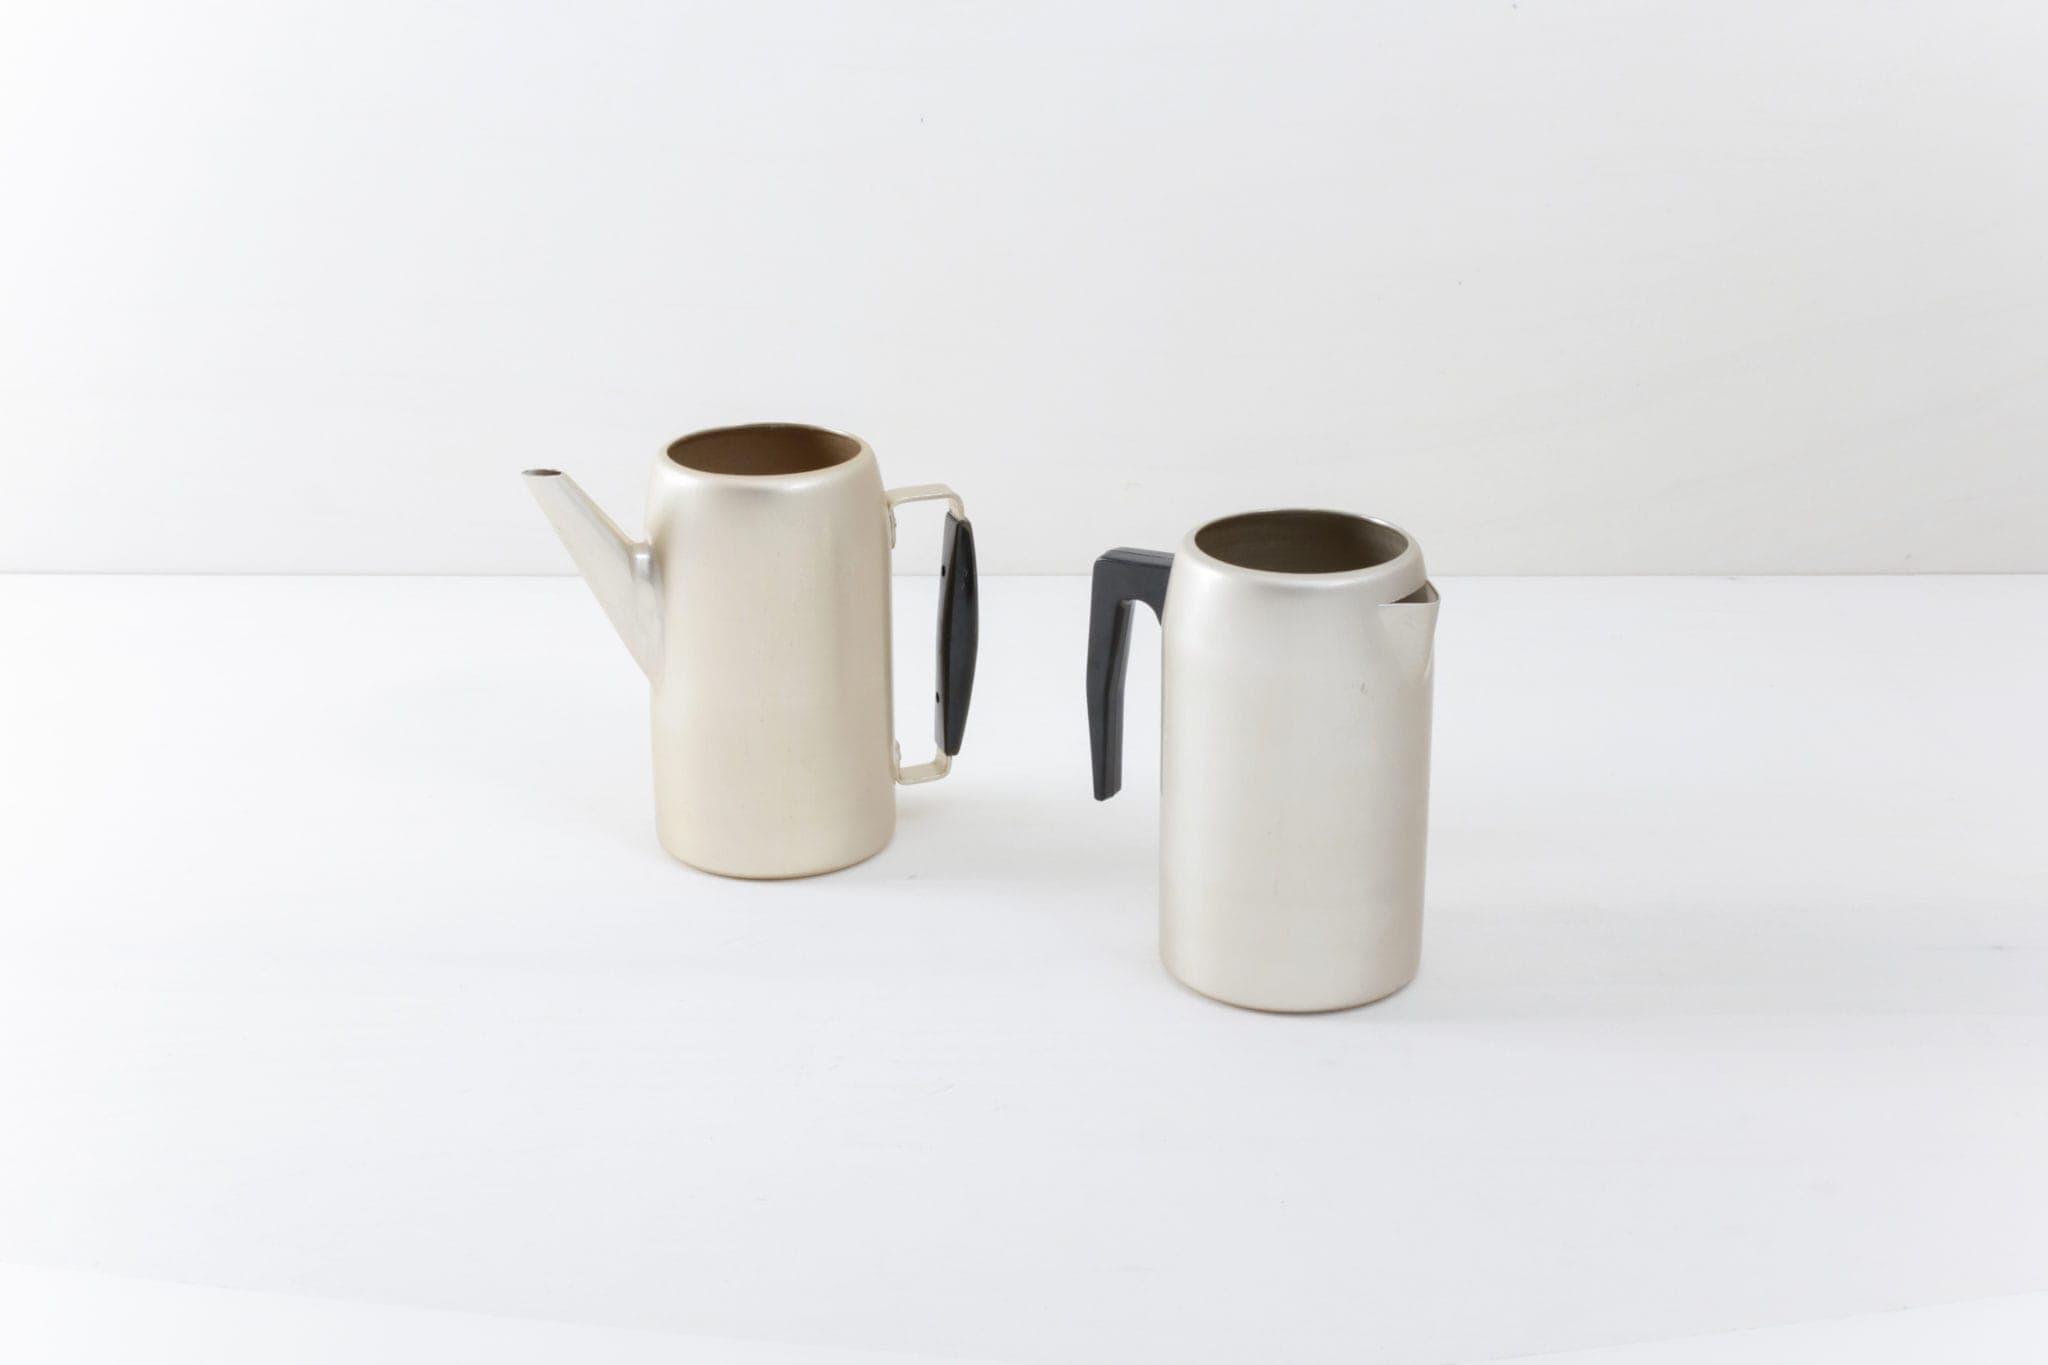 Aluminiumkanne dezentes Rosengold,Blumenvase Gold-Optik. NVA Teekanne, Kaffeekanne DDR Armee